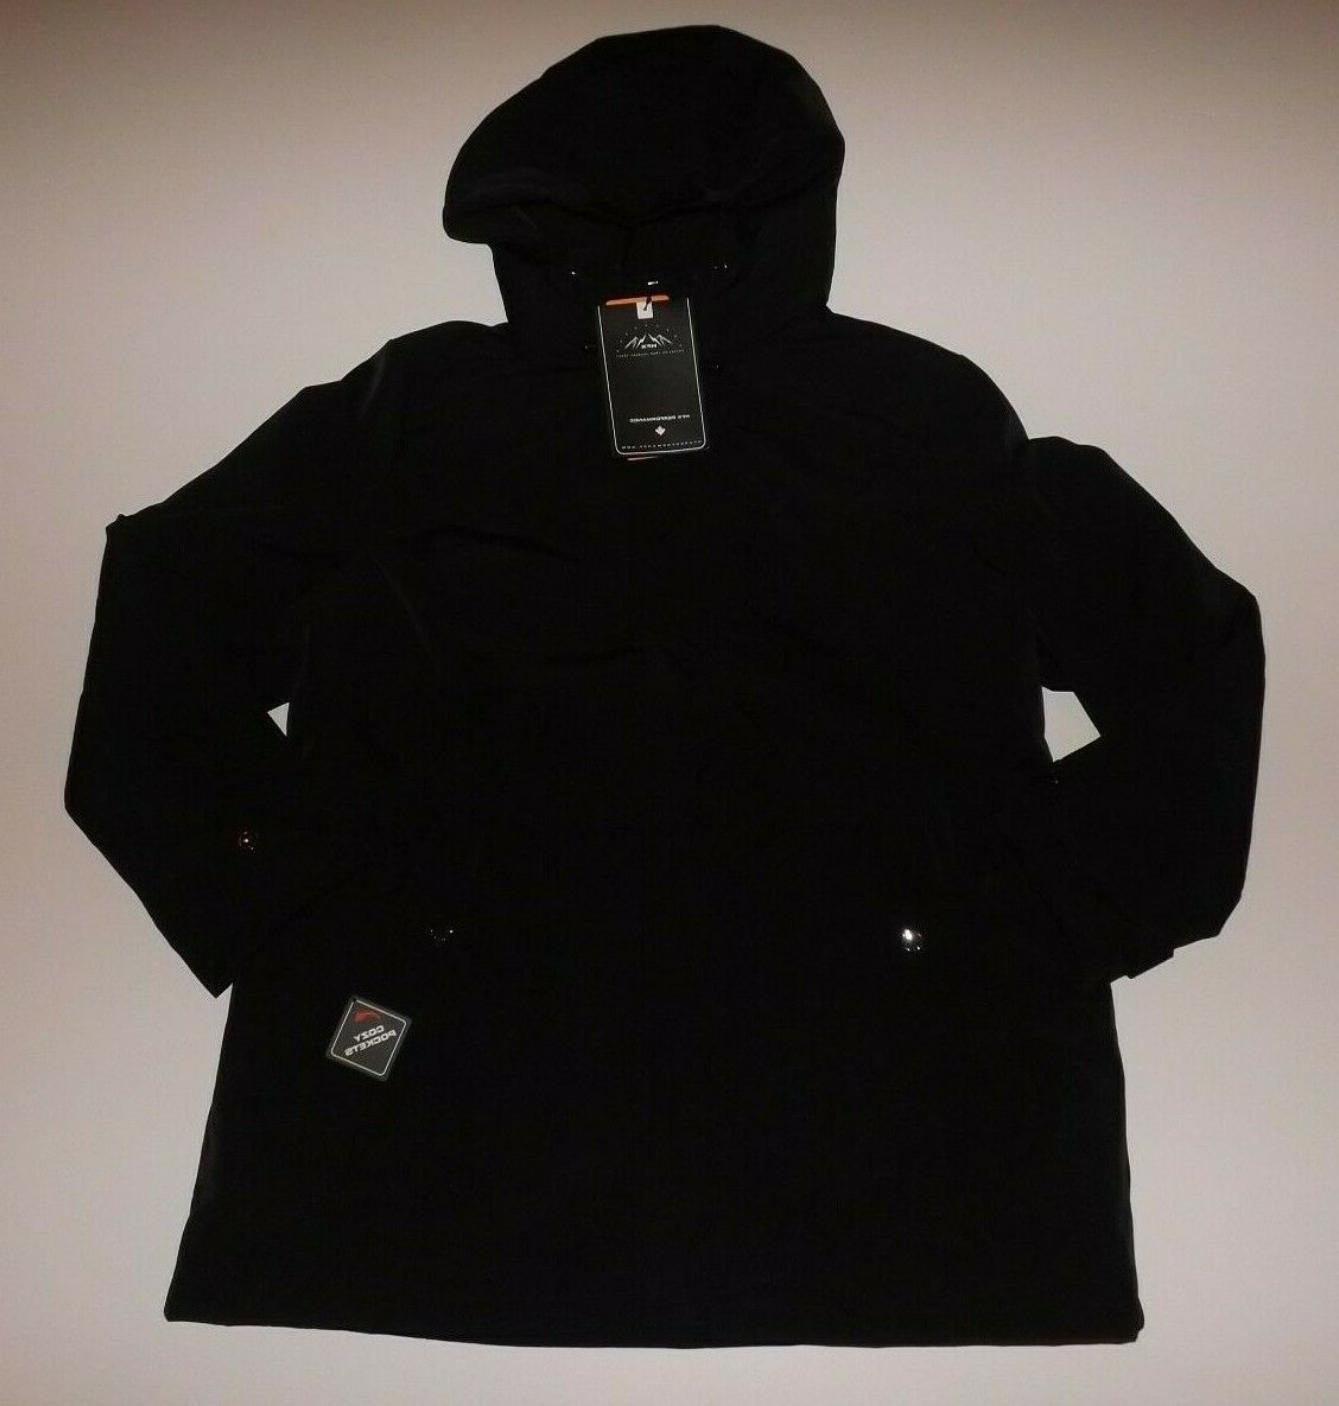 HFX Women's Water-Resistant Rain Jacket Black L